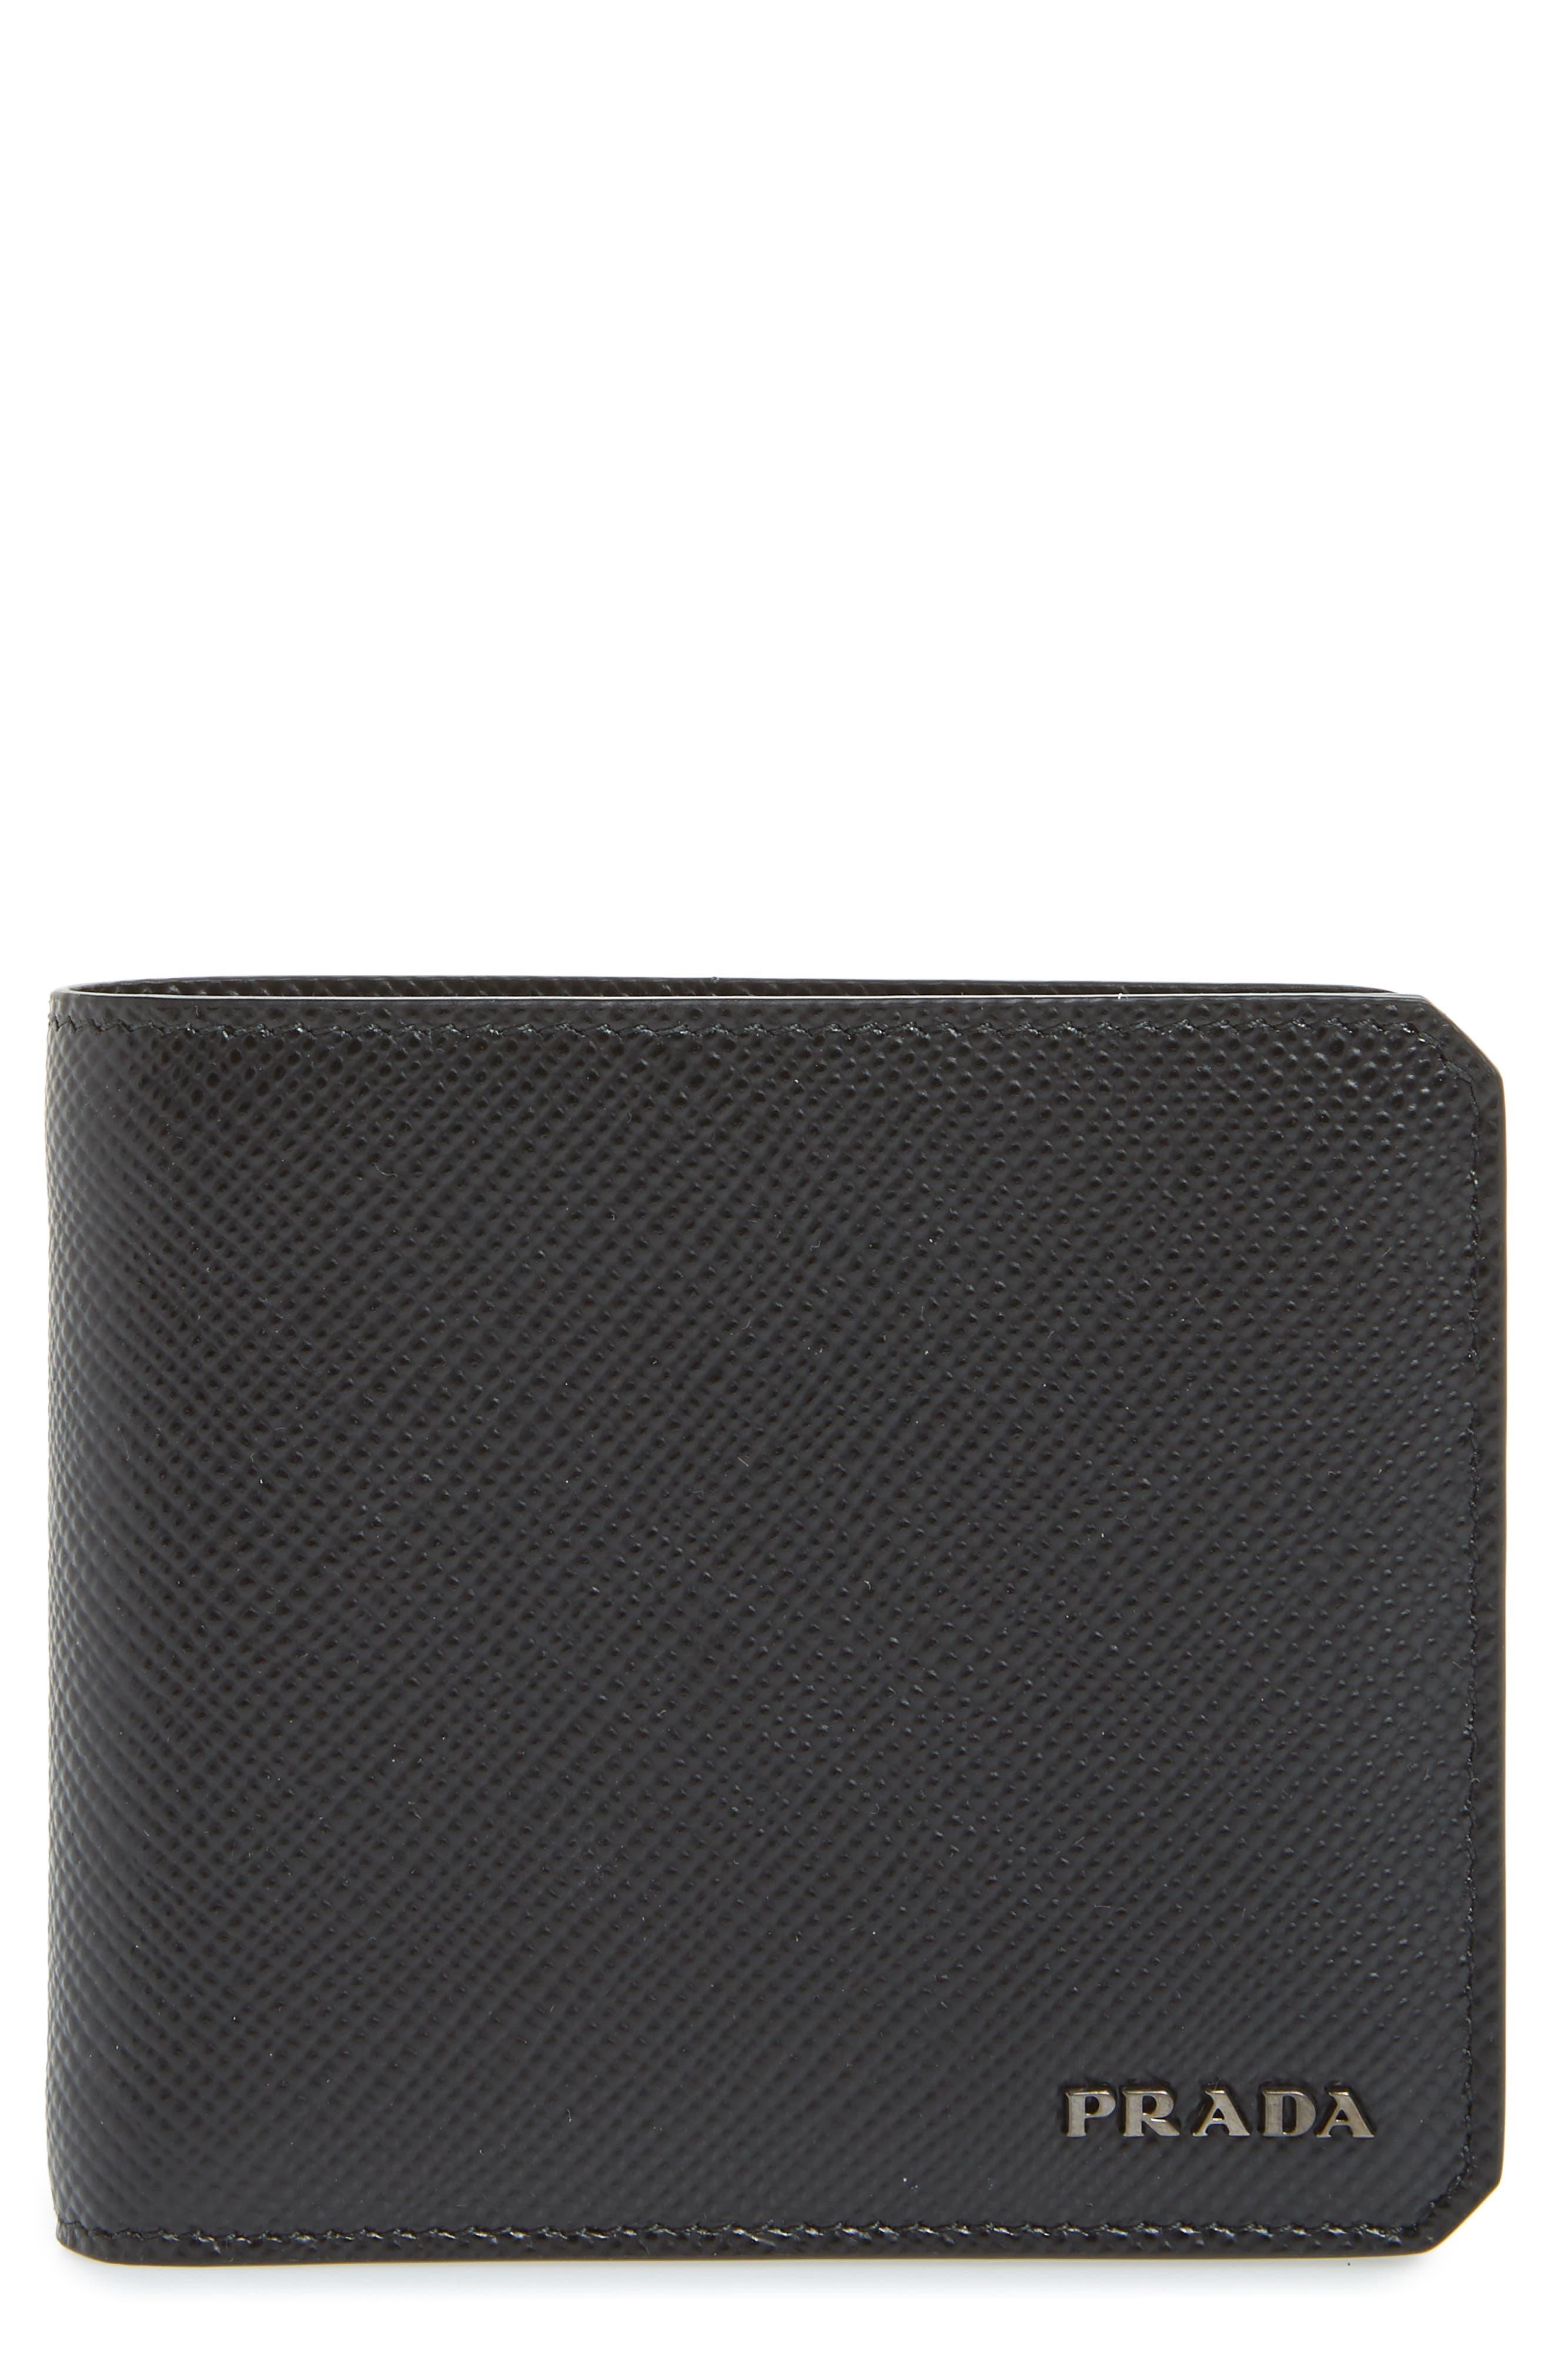 Saffiano Leather Wallet,                             Main thumbnail 1, color,                             001